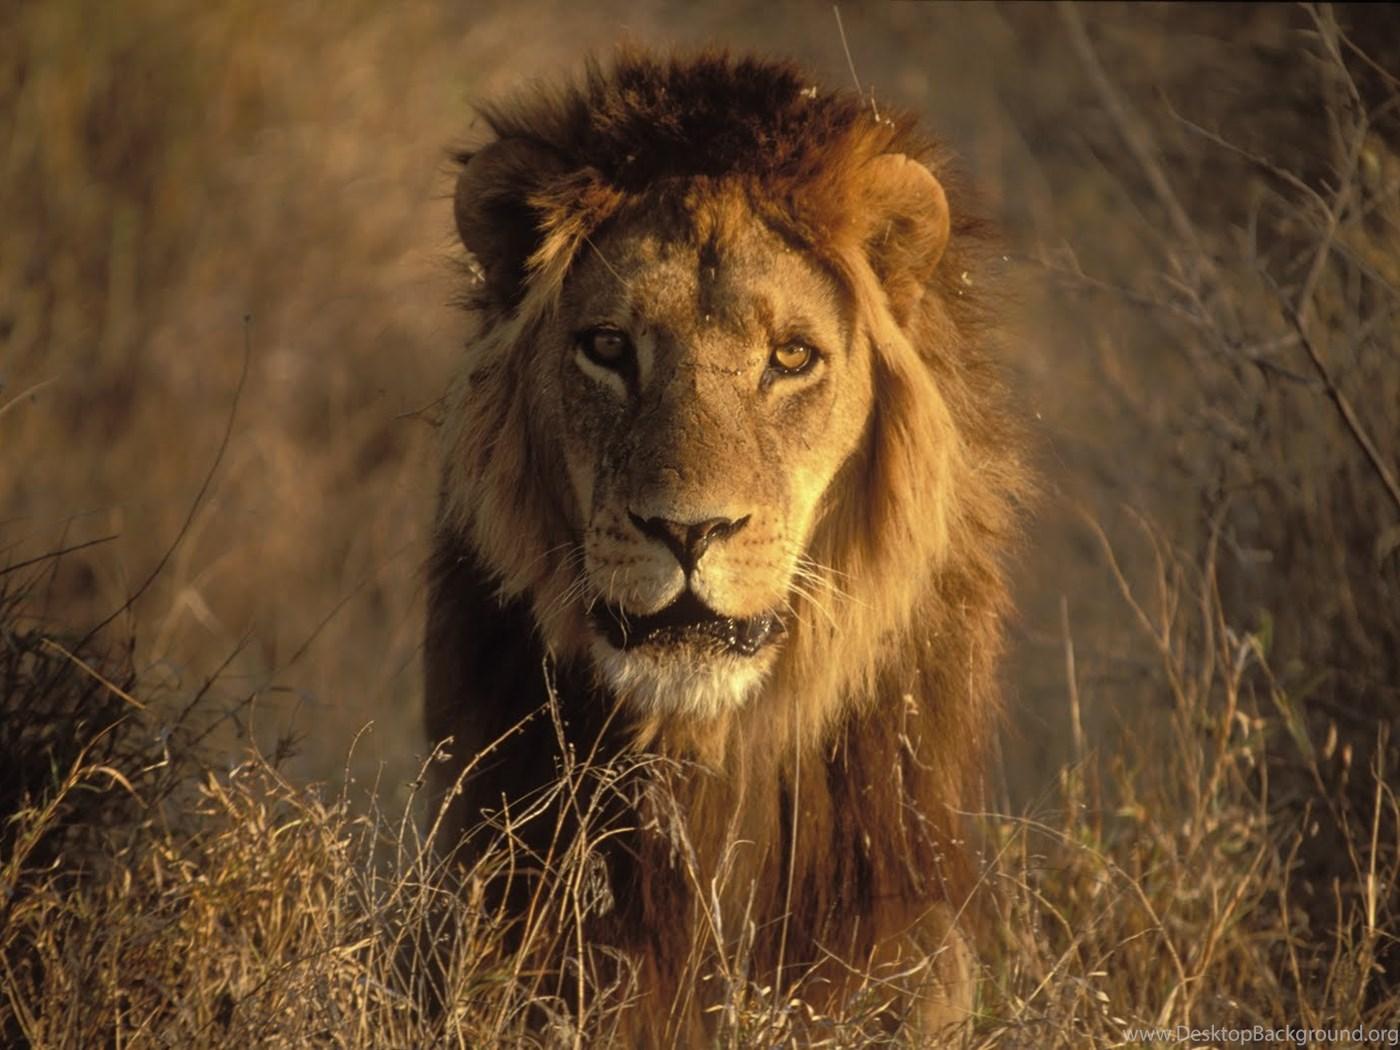 Roaring Lion Pics Wallpapers 3d Hd Pictures Desktop Background